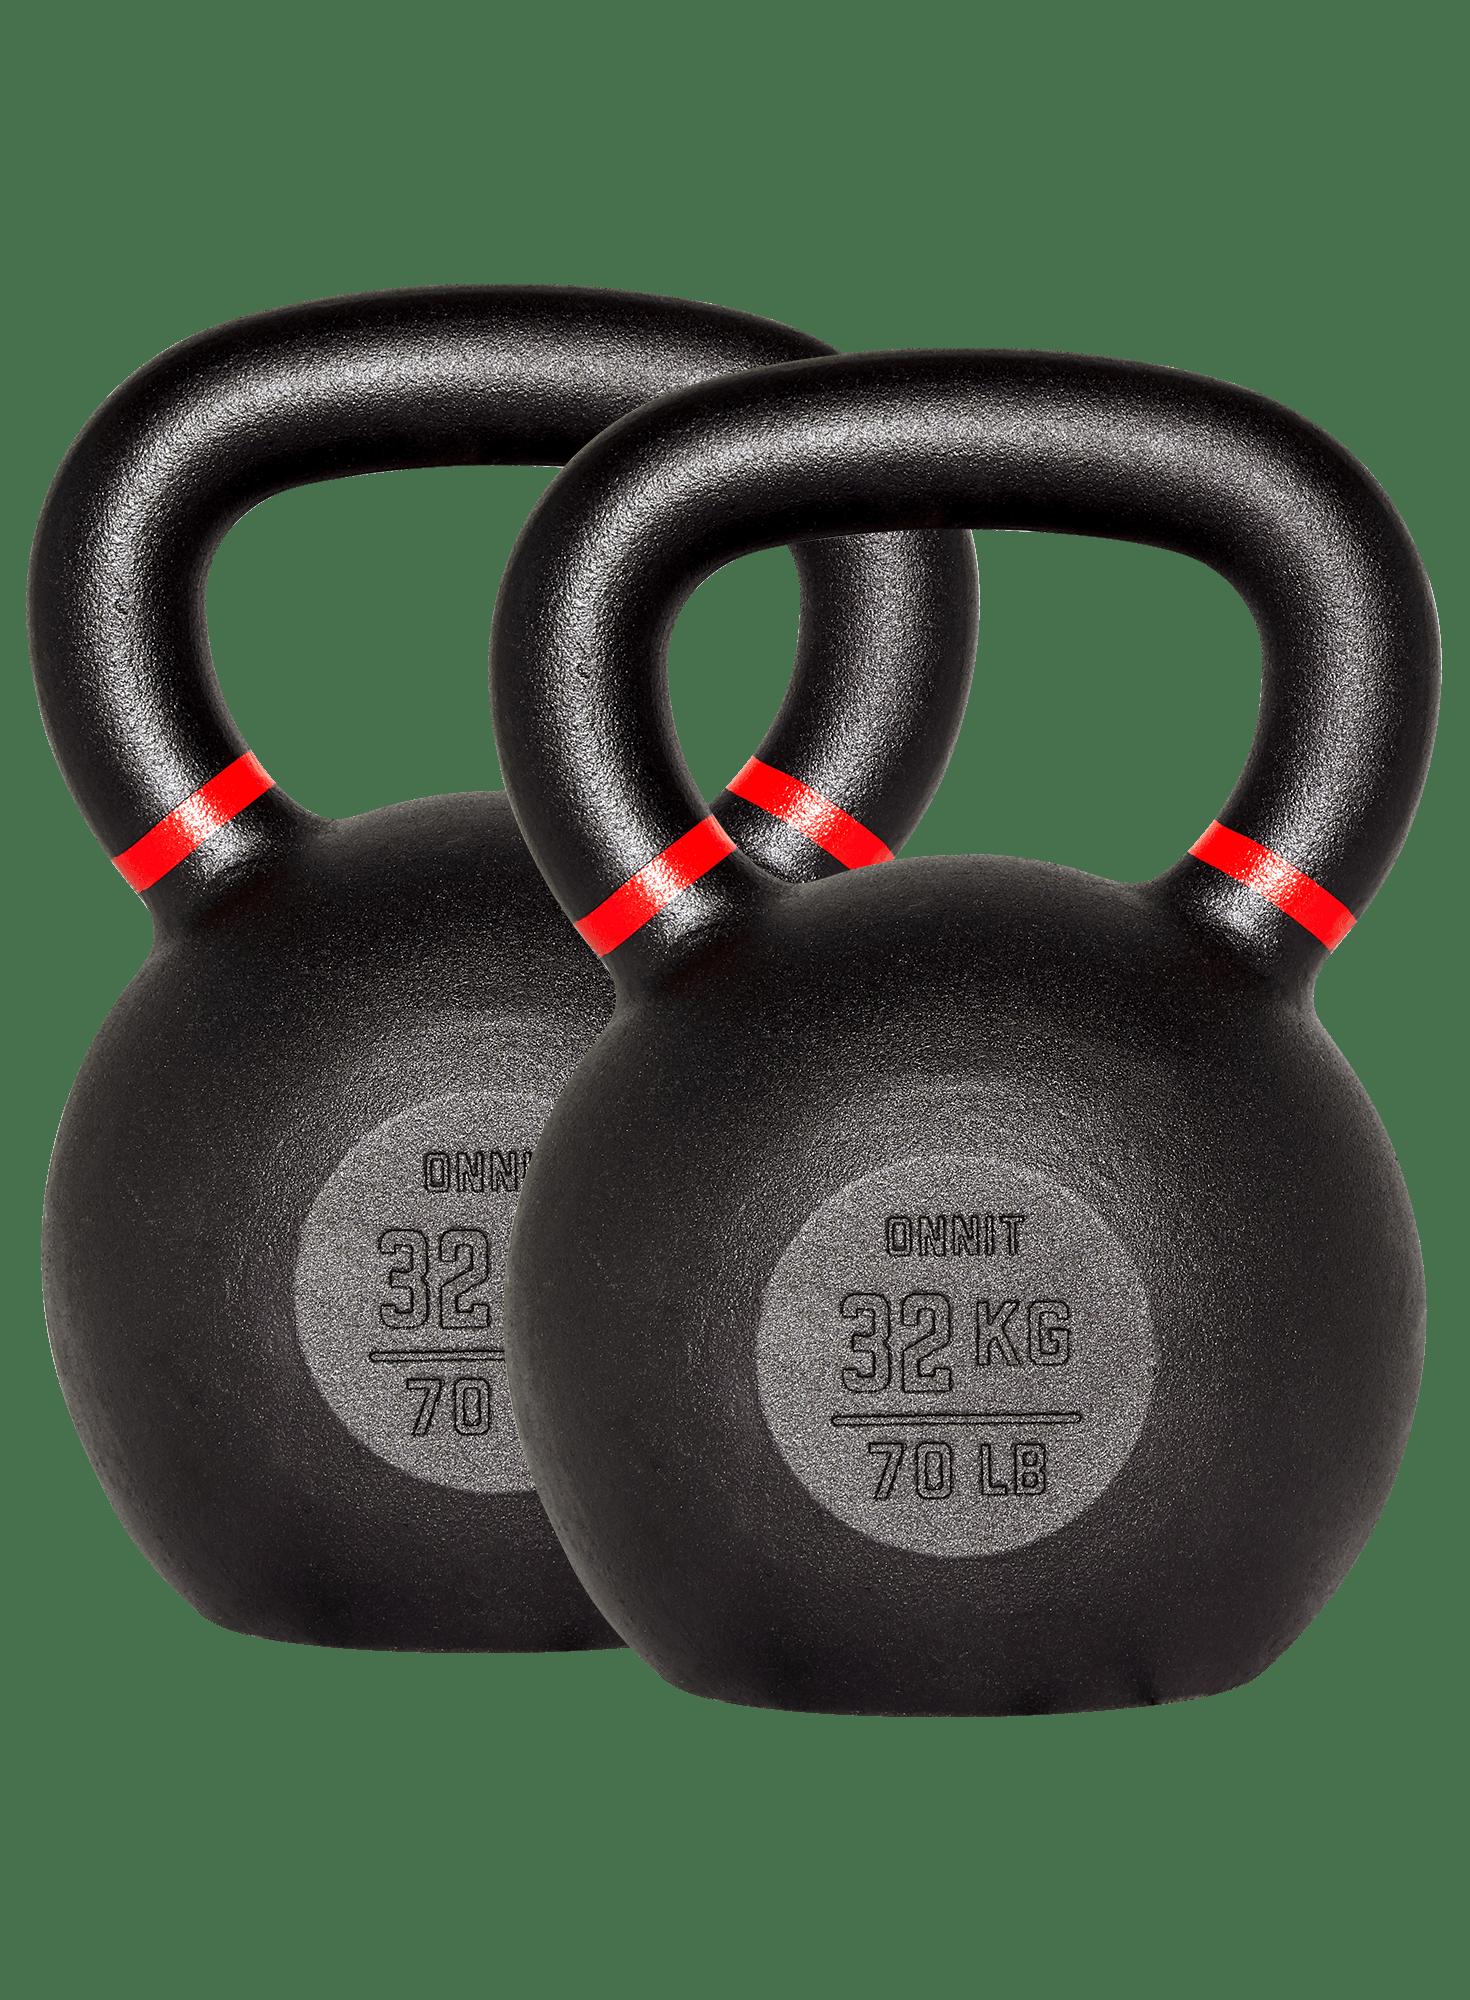 onnit double 32kg kettlebells onnitonnit double 32kg kettlebells